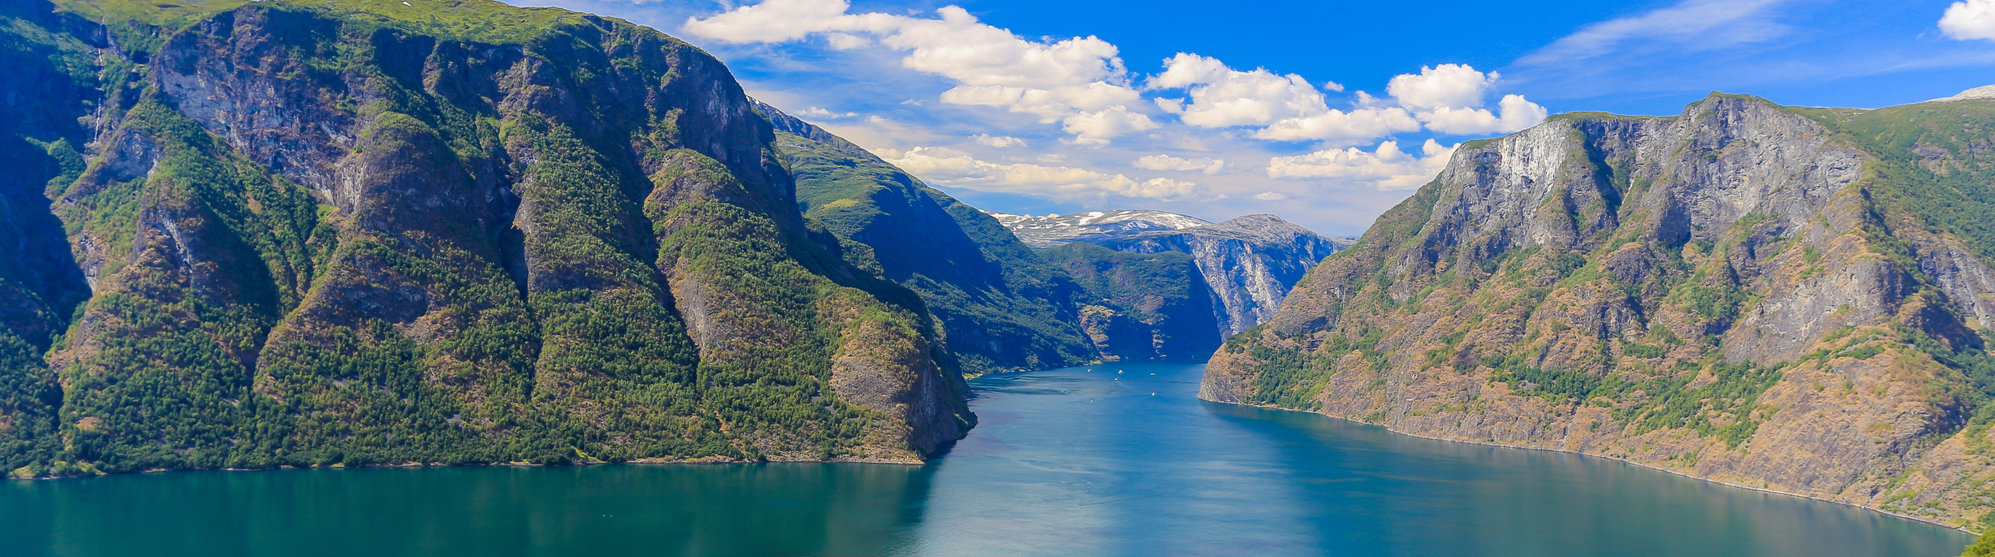 Fjord Tours Bergen Norway